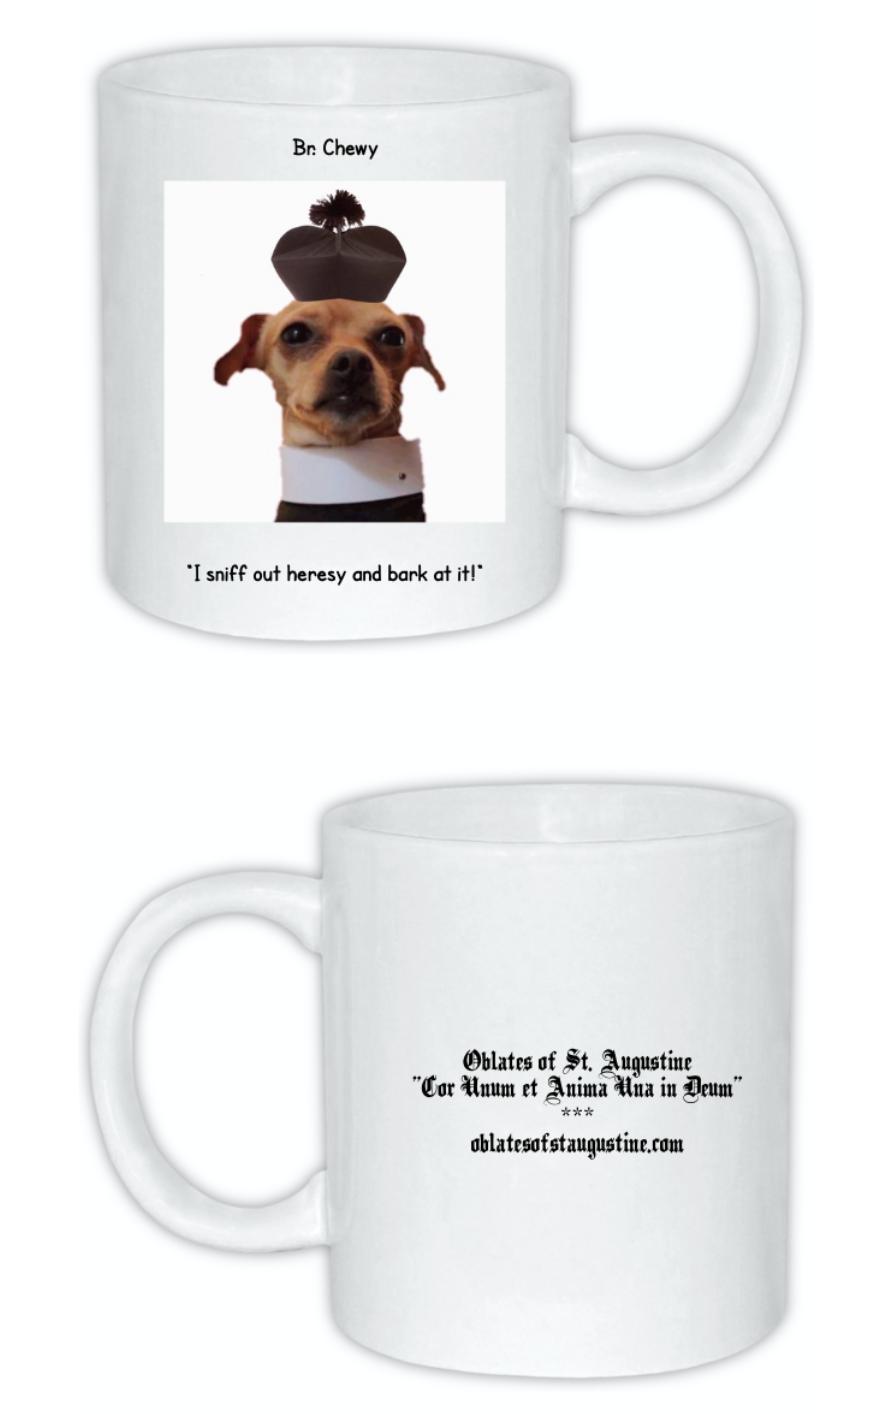 br-chewy-mug-3